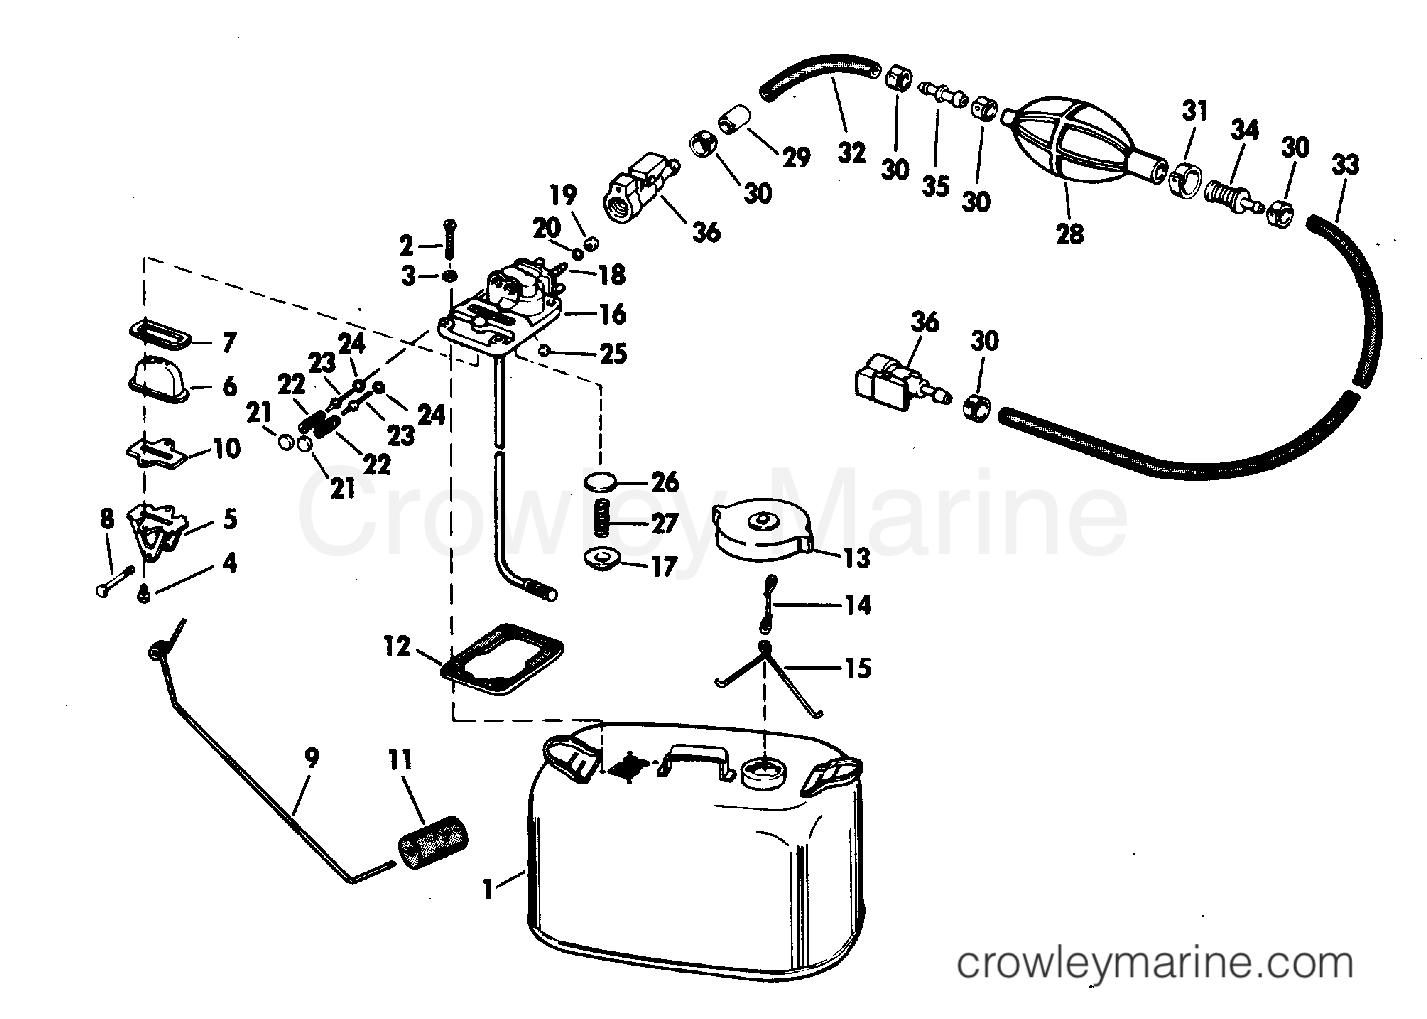 Fuel Tank 6 Gallon